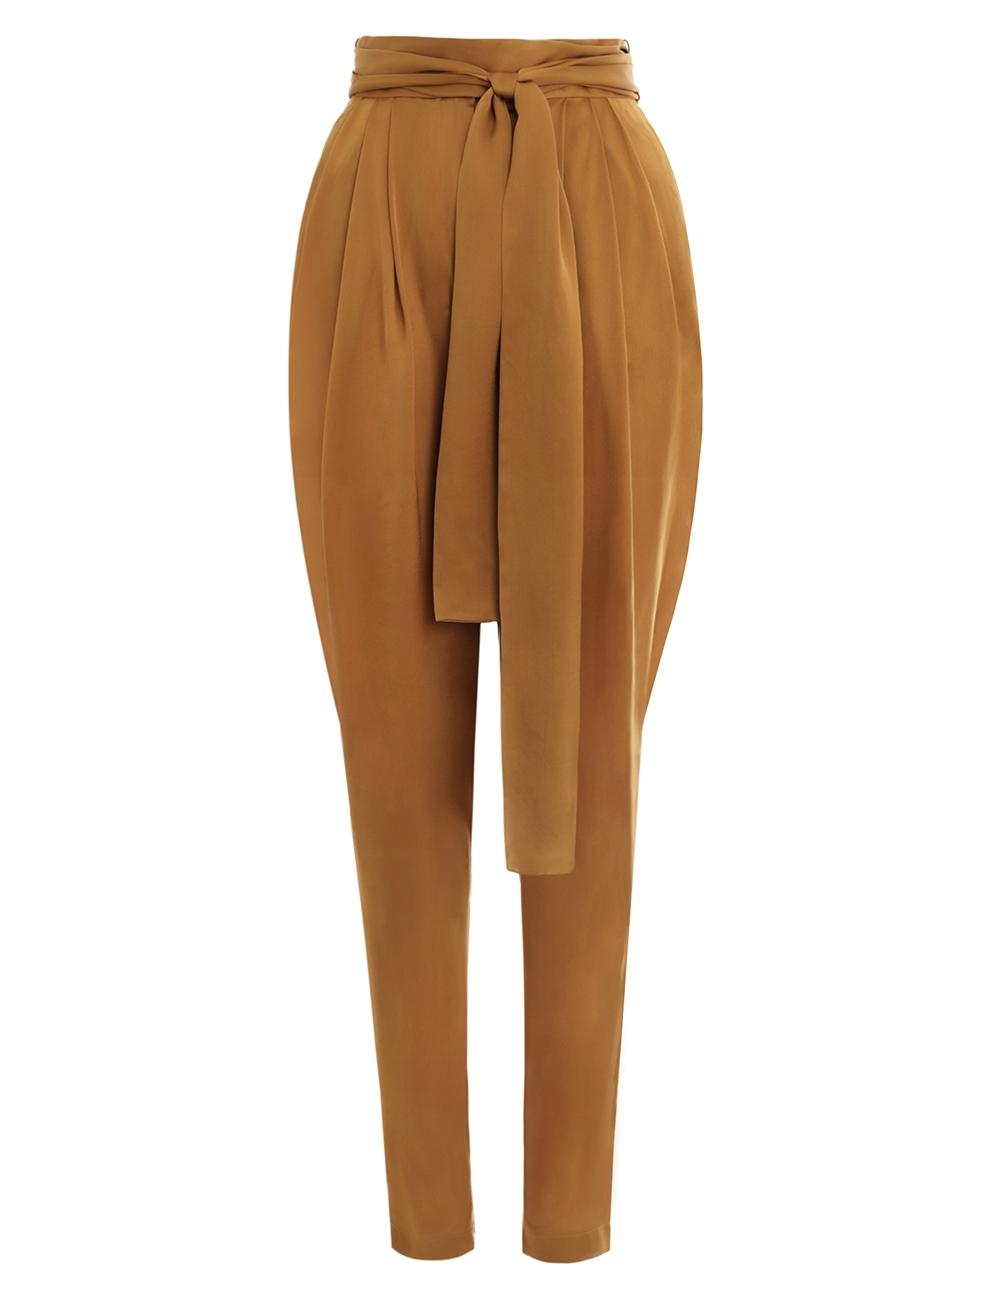 Resistance Slim Pant